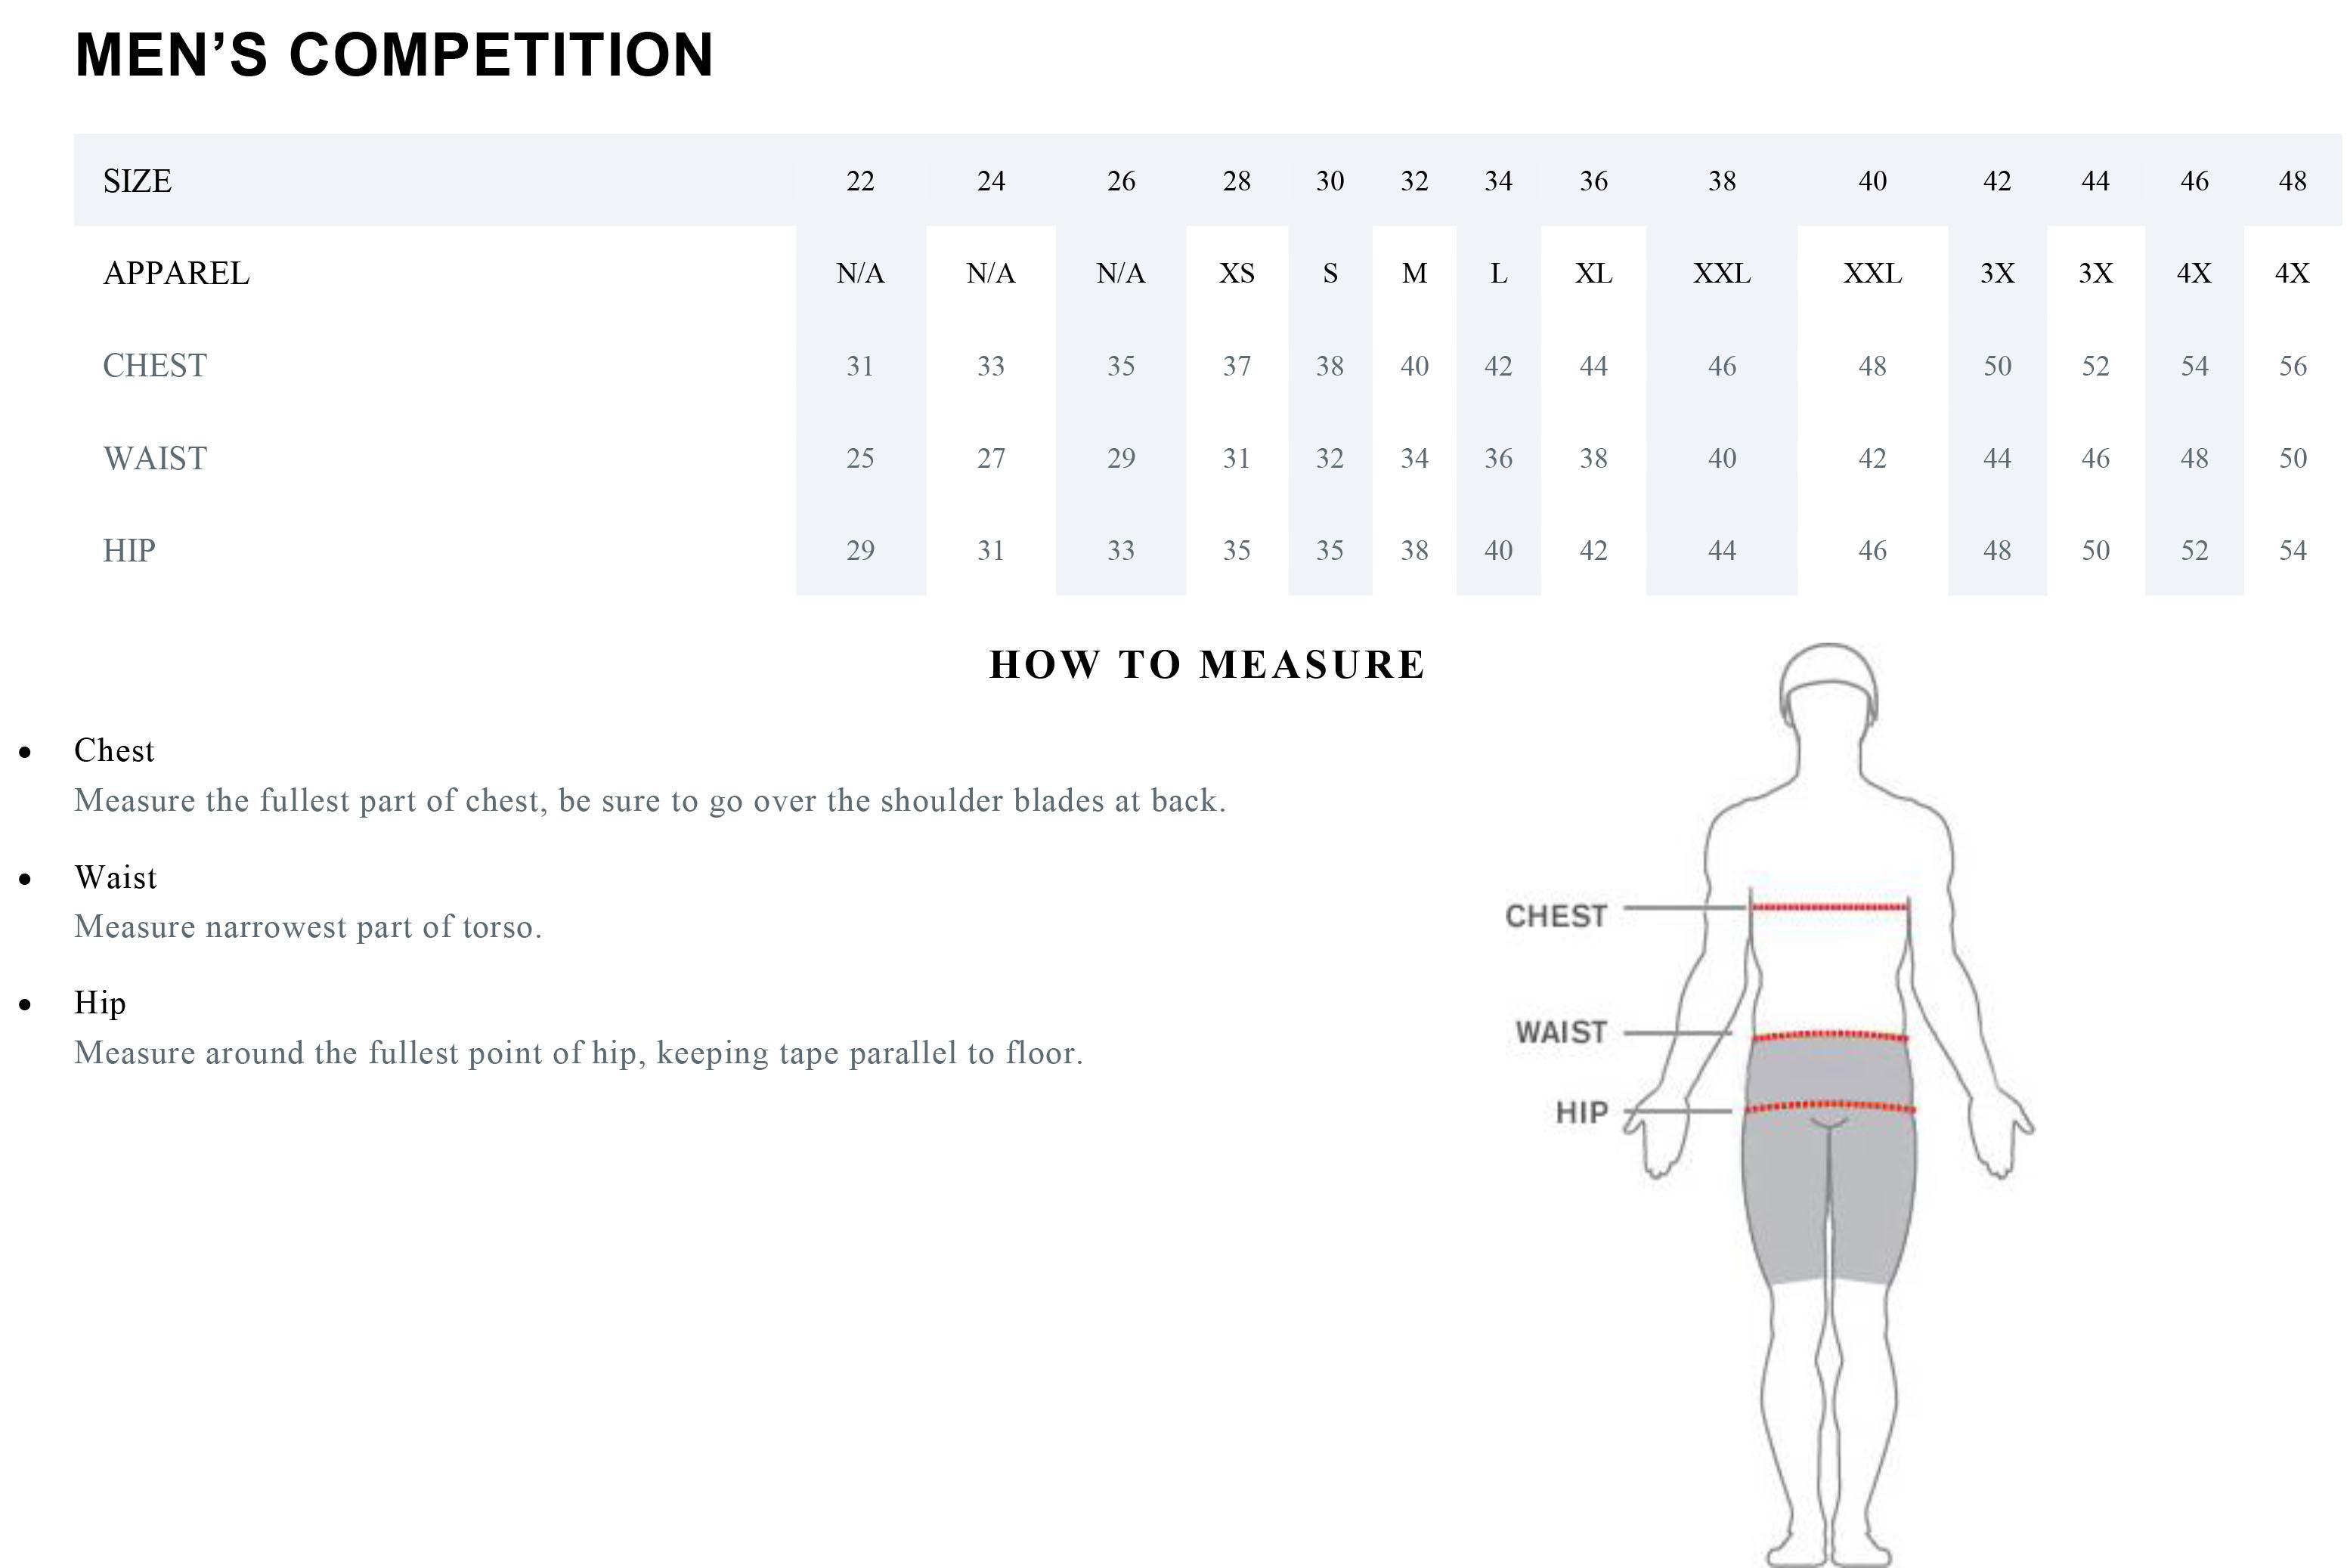 speedo-men-competition-sizing-chart.jpg